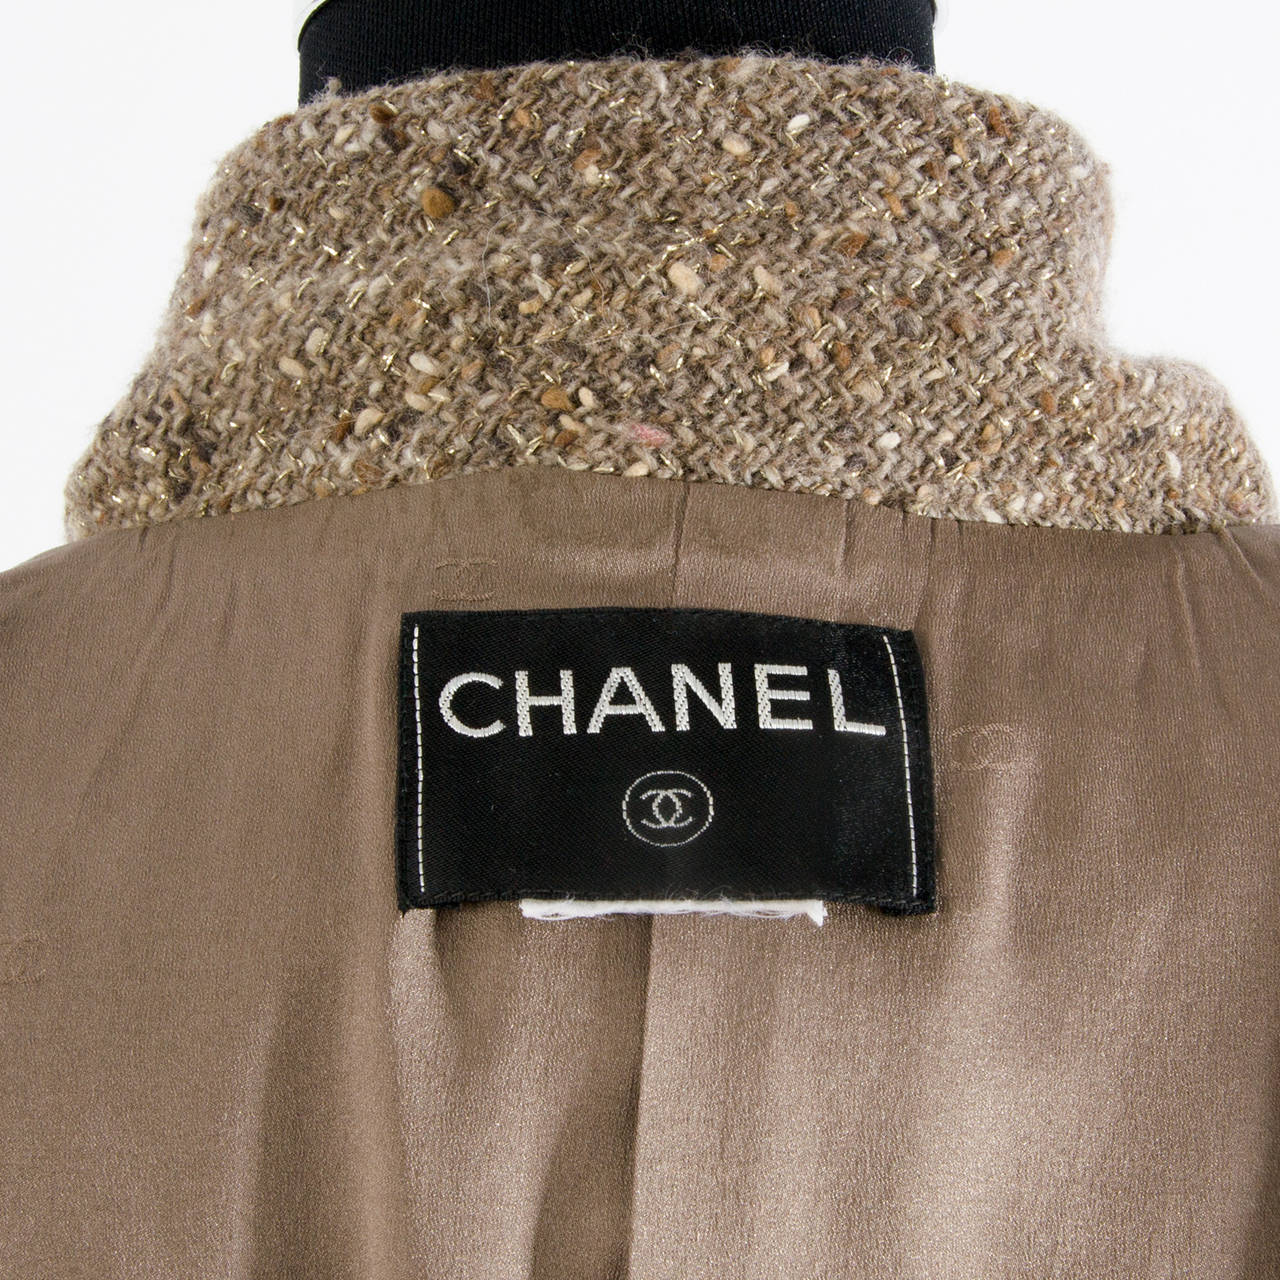 Chanel Tweed Brown Jacket For Sale 1